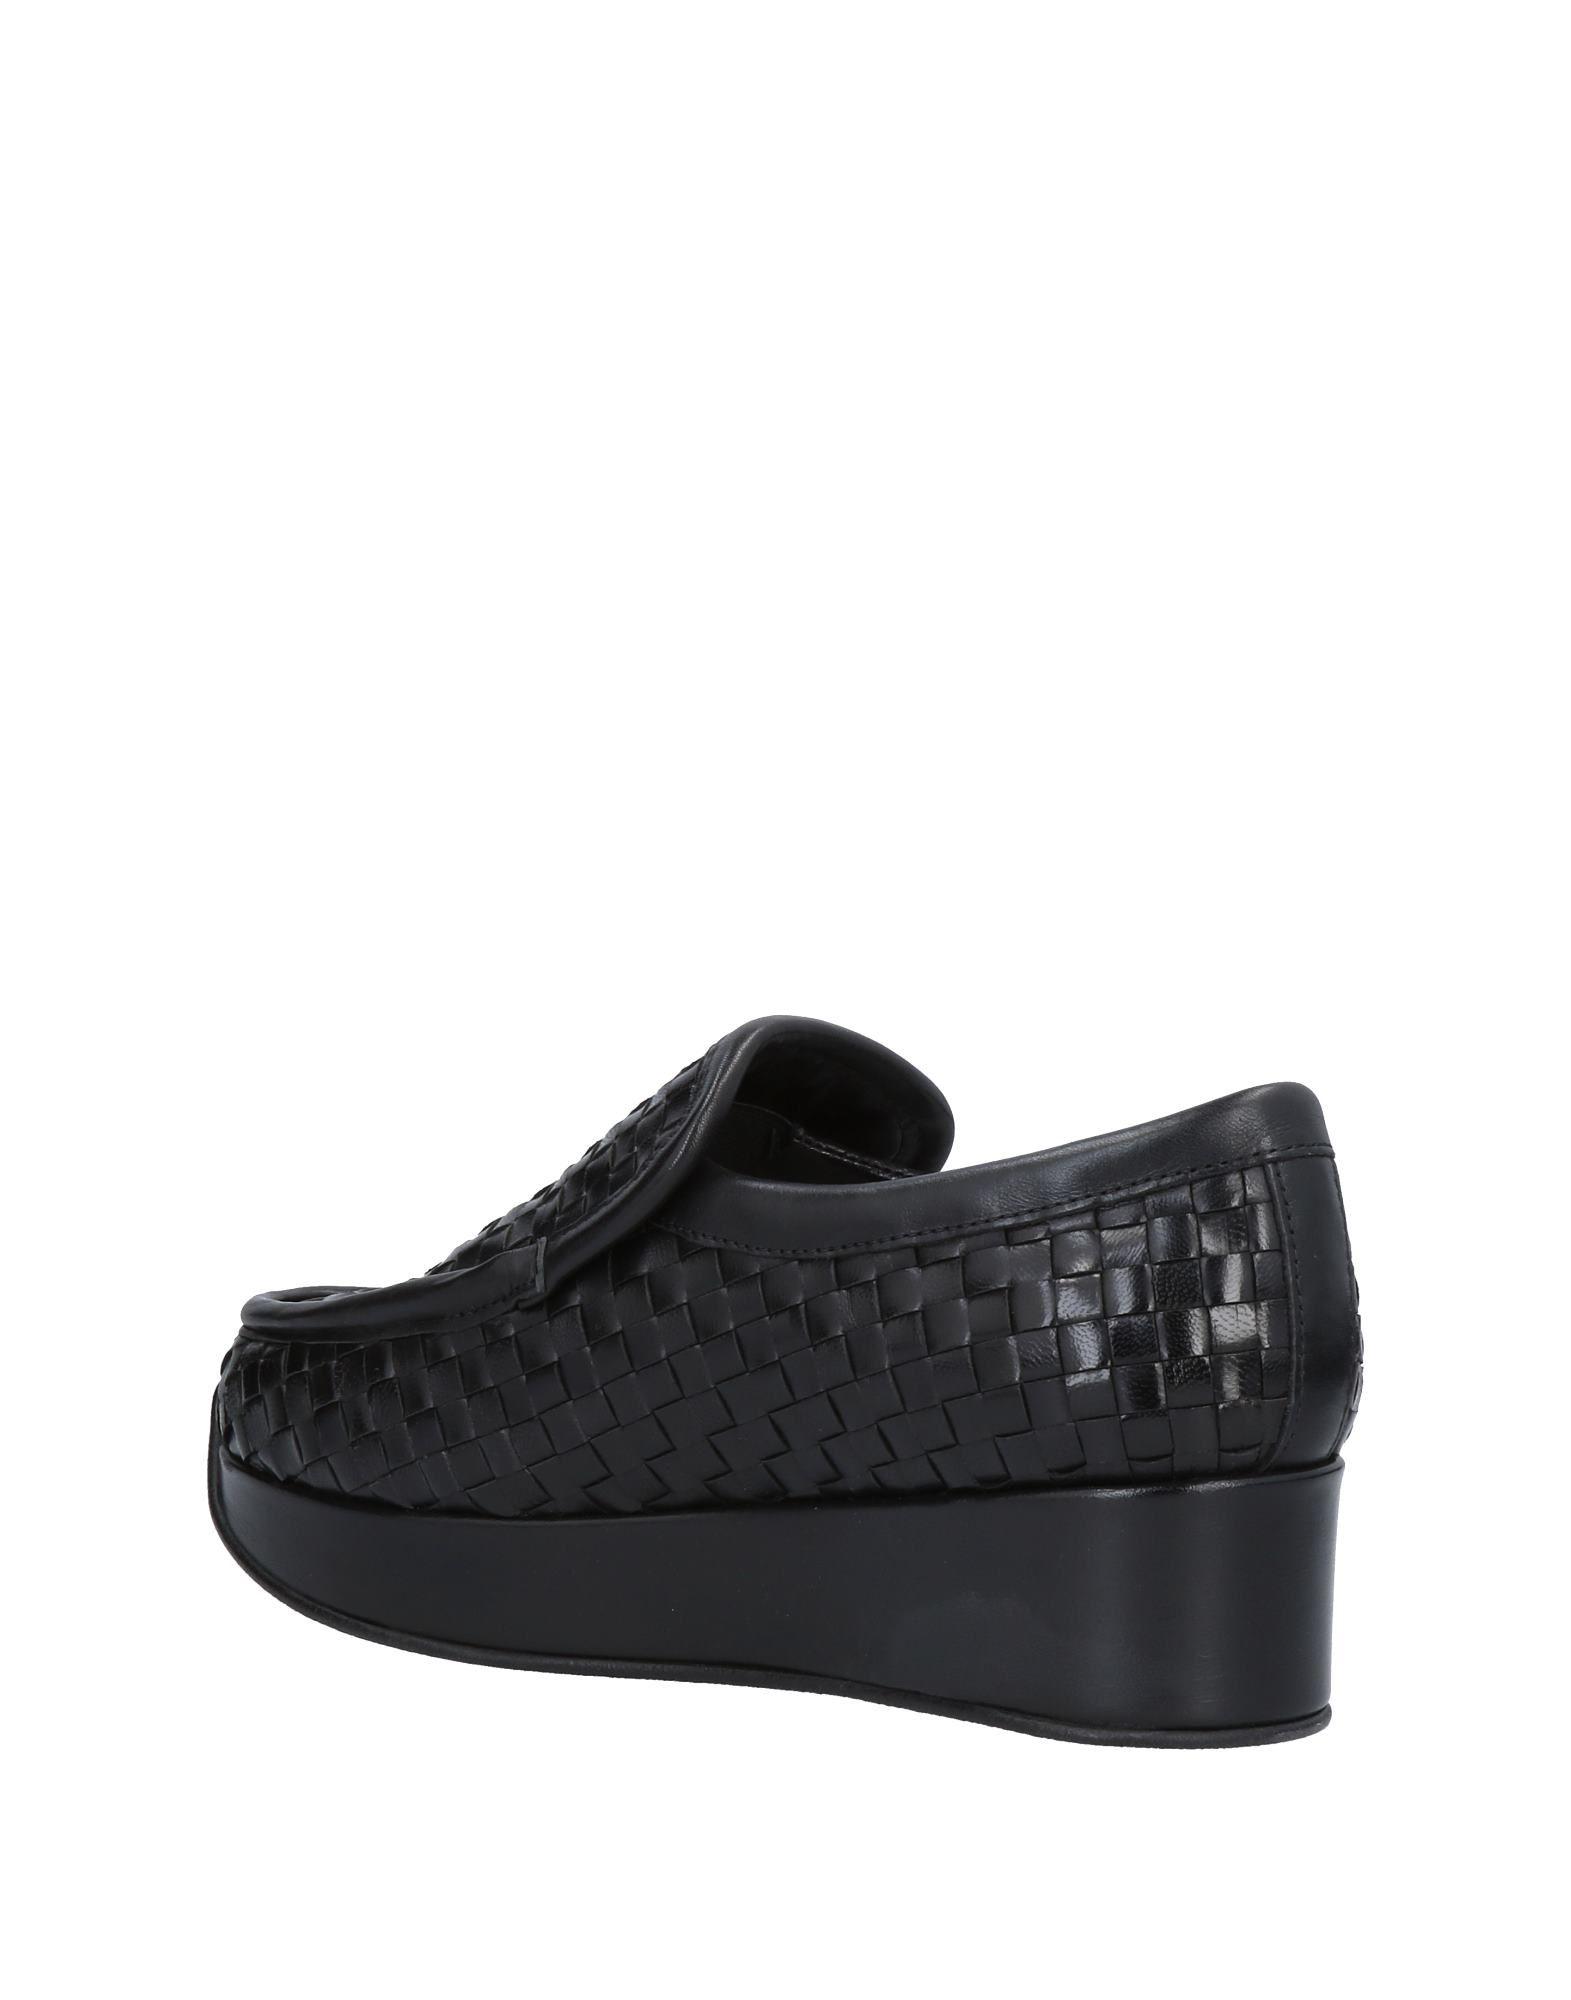 Rabatt Schuhe  Stephane Kélian Mokassins Damen  Schuhe 11486421GM ca3ebd